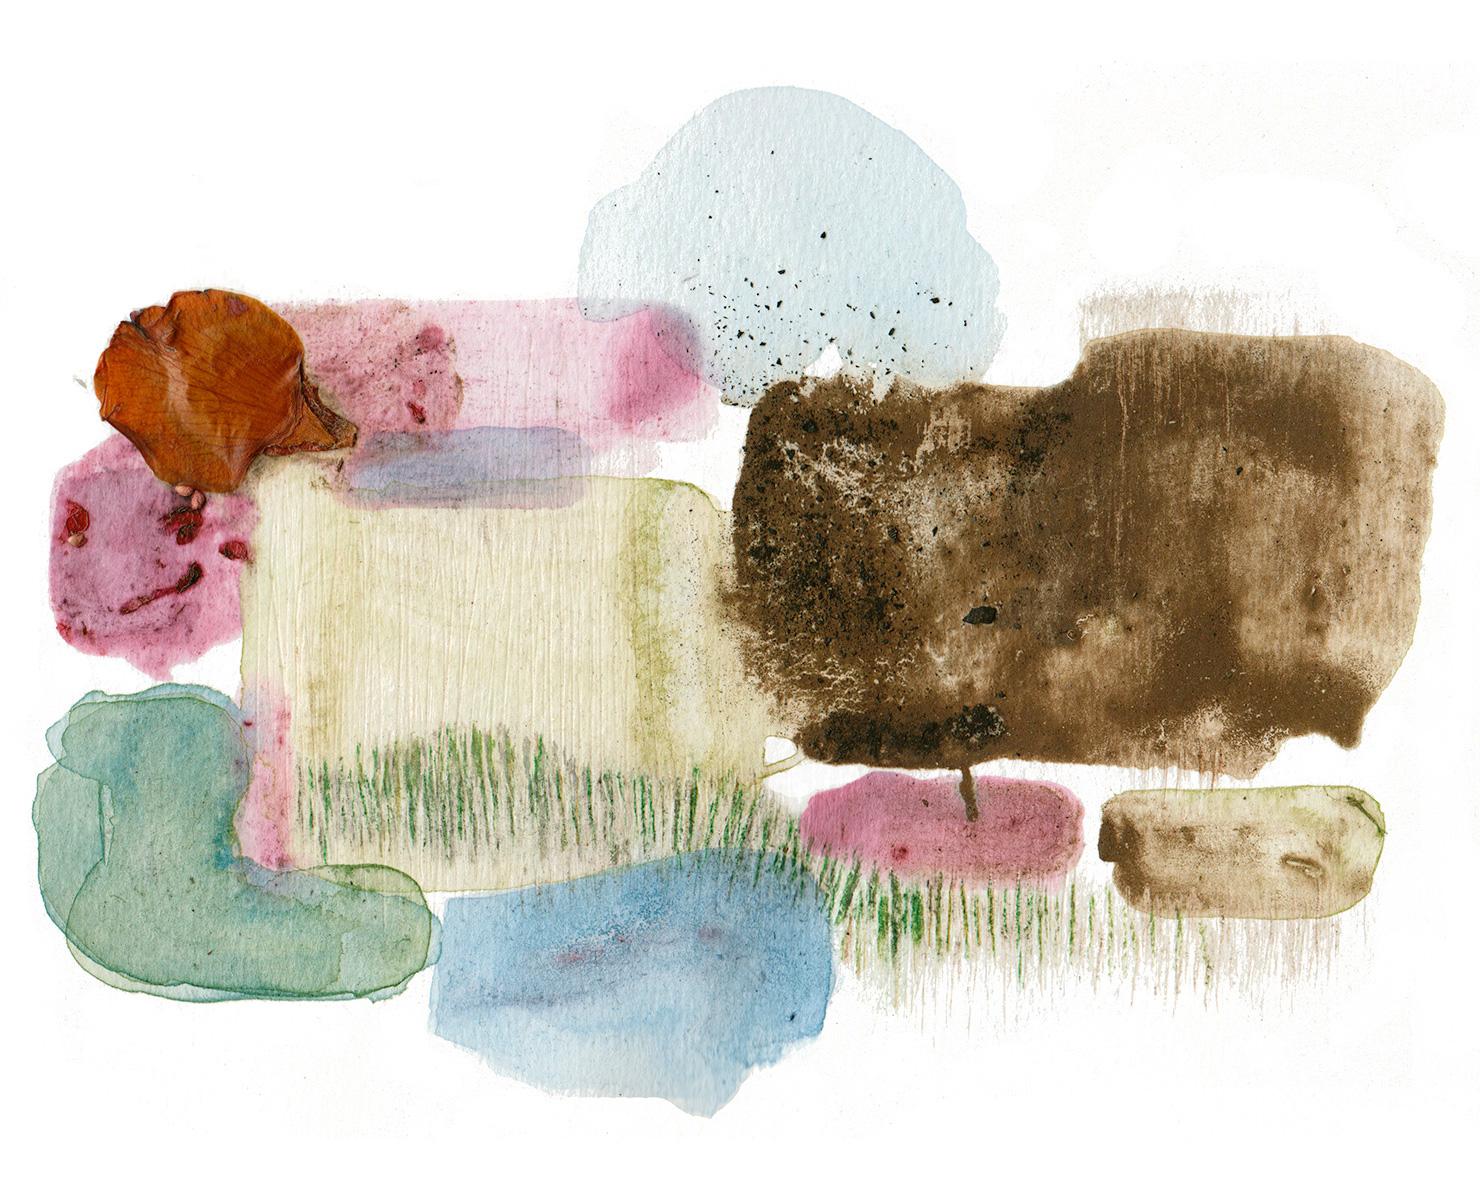 "N38°16'23"", W122°15'9""  Grass, minerals, dirt, berries, dandelions / 13 in x 10 in"